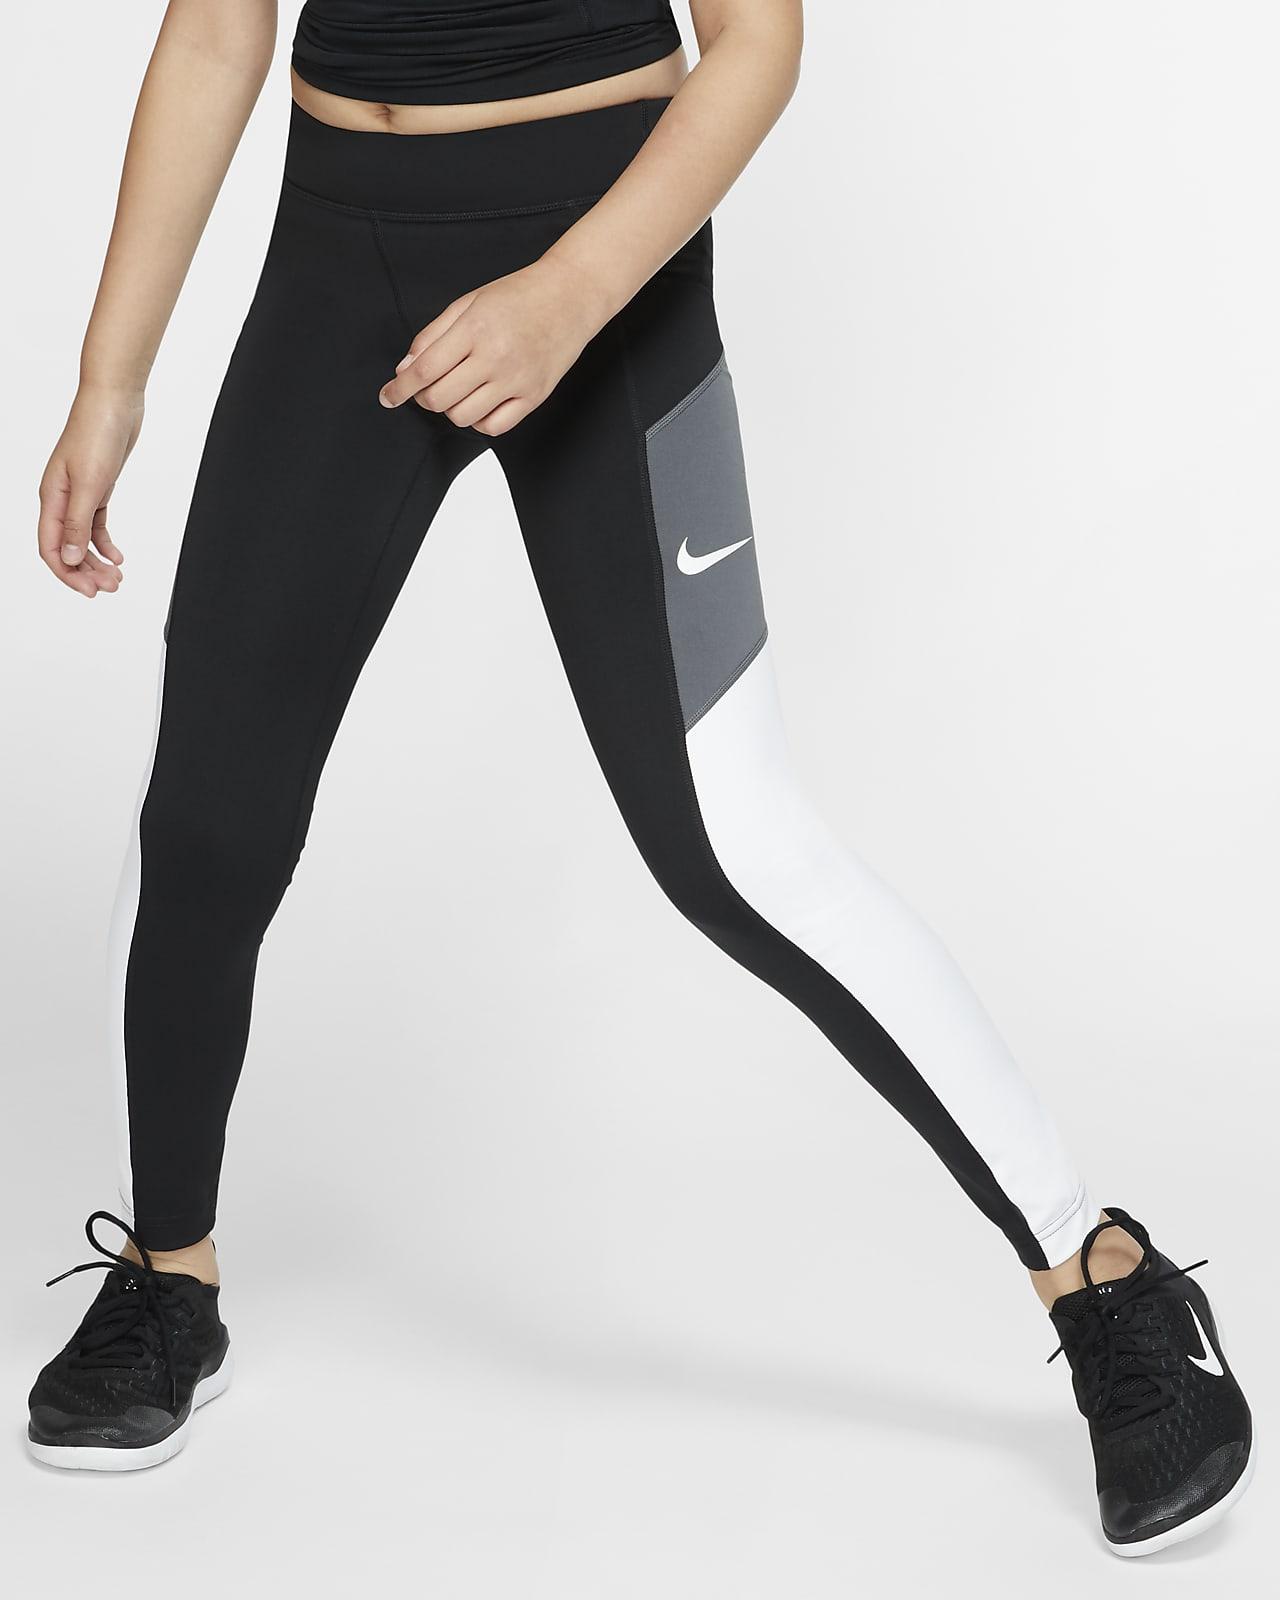 Nike Trophy Trainings-Leggings für ältere Kinder (Mädchen)